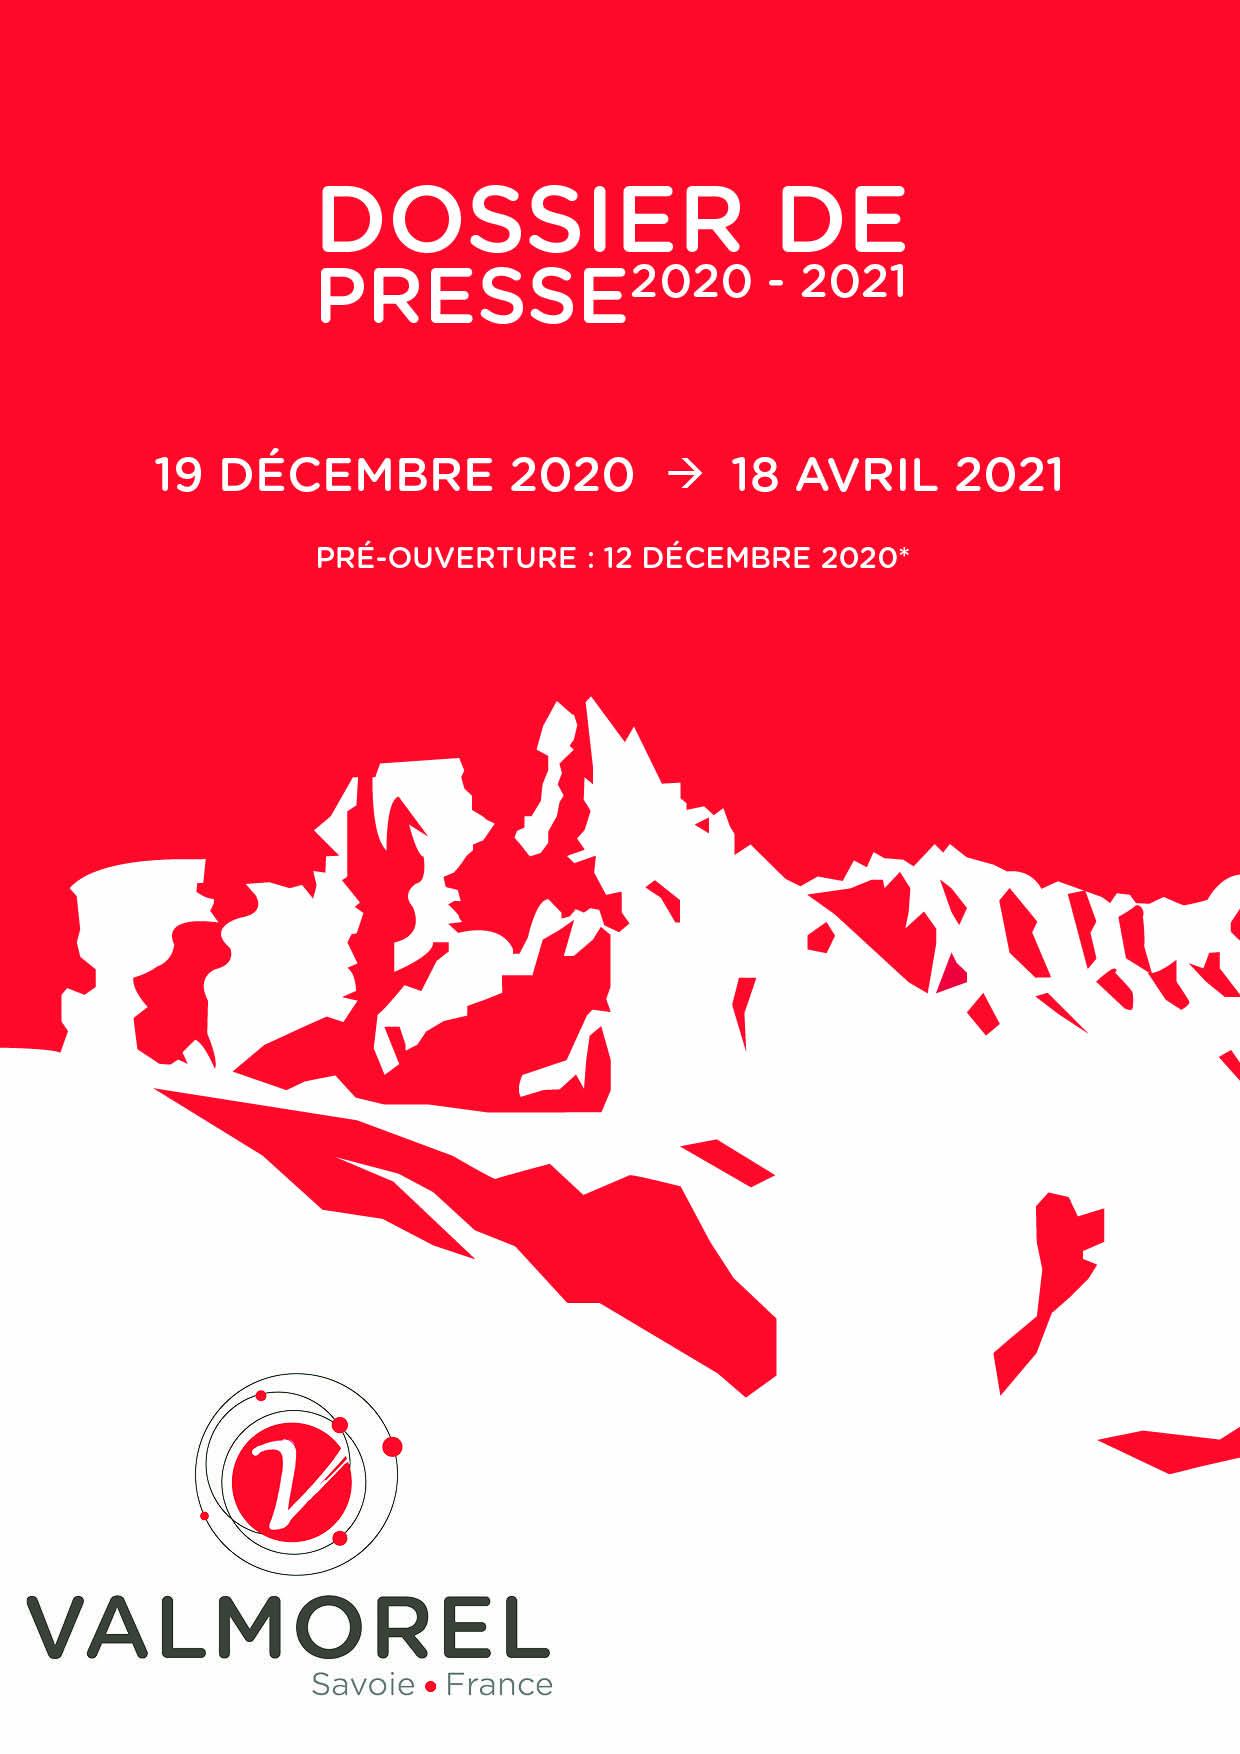 Dossier de presse hiver 2020 2021